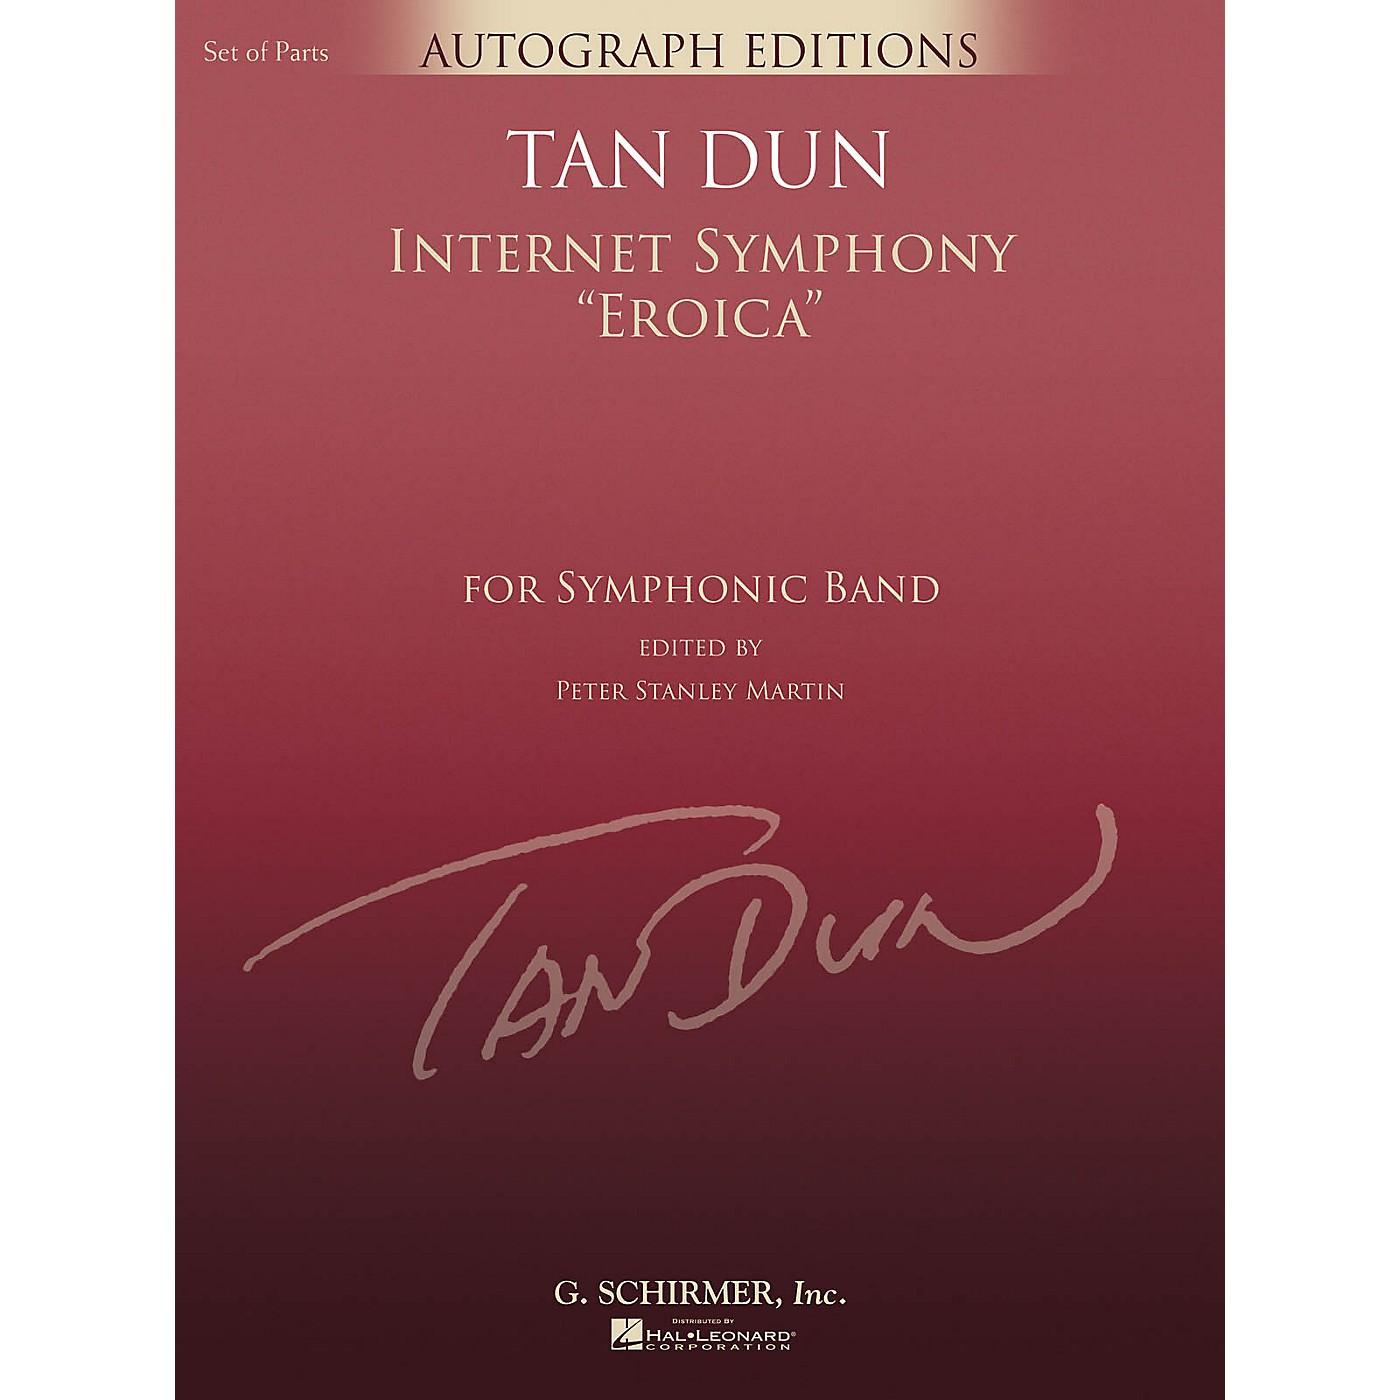 G. Schirmer Internet Symphony Eroica (G. Schirmer Autograph Edition) Concert Band Level 5 Composed by Tan Dun thumbnail